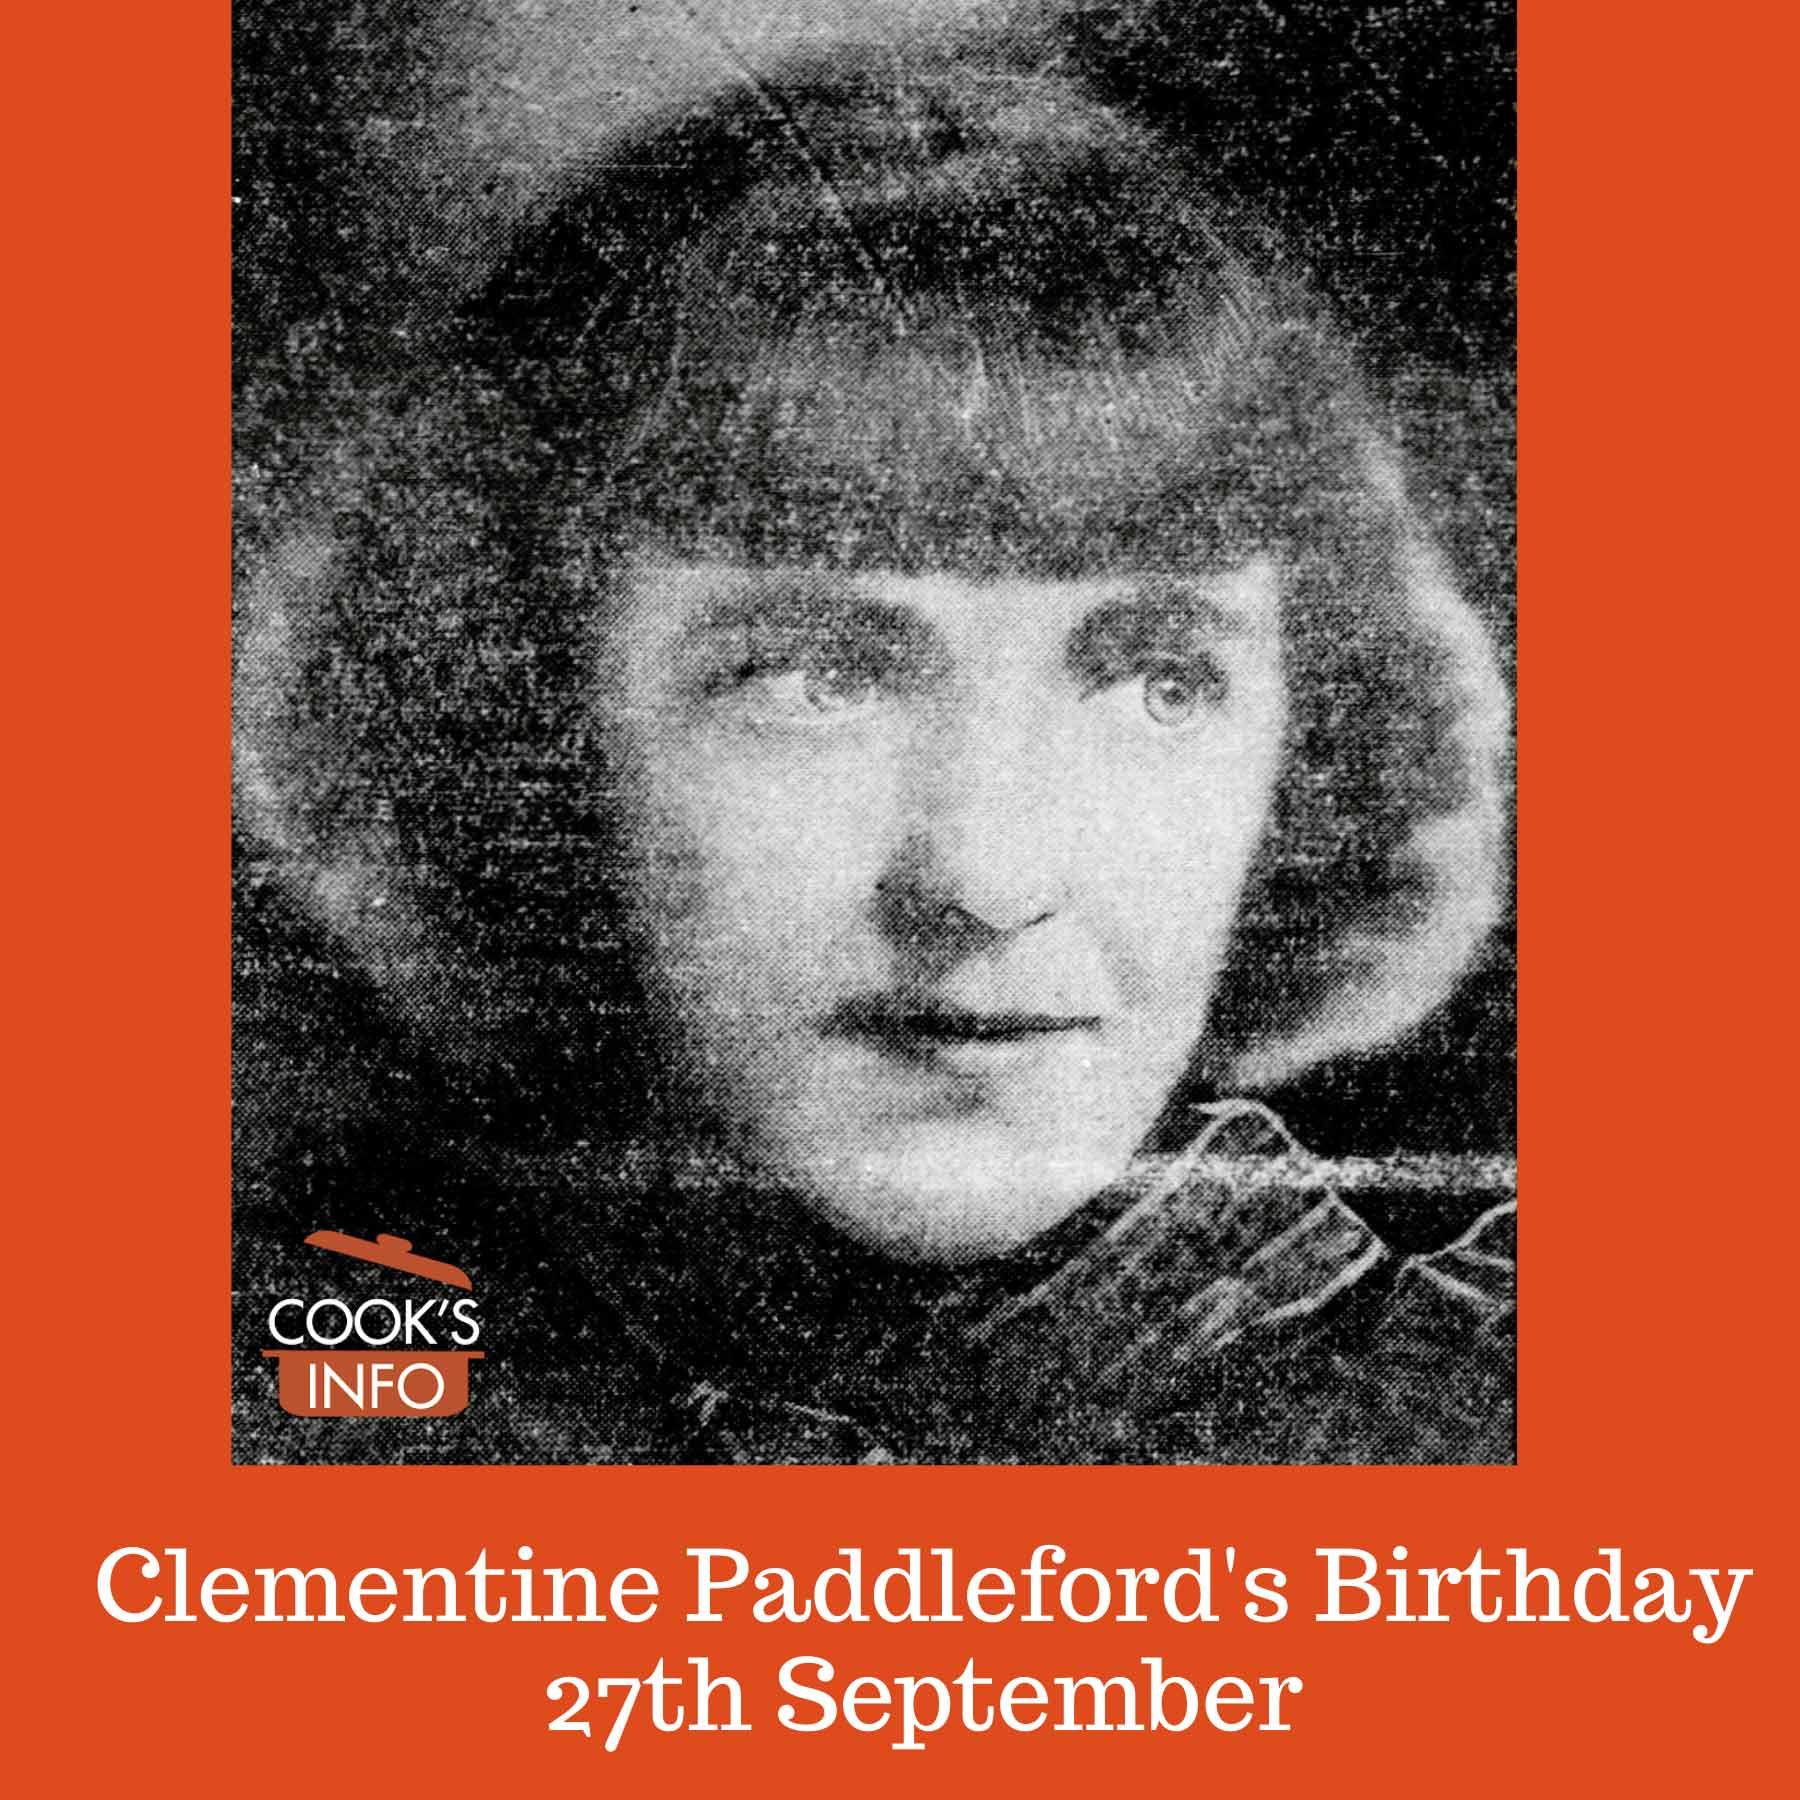 Clementine Paddleford, 1939